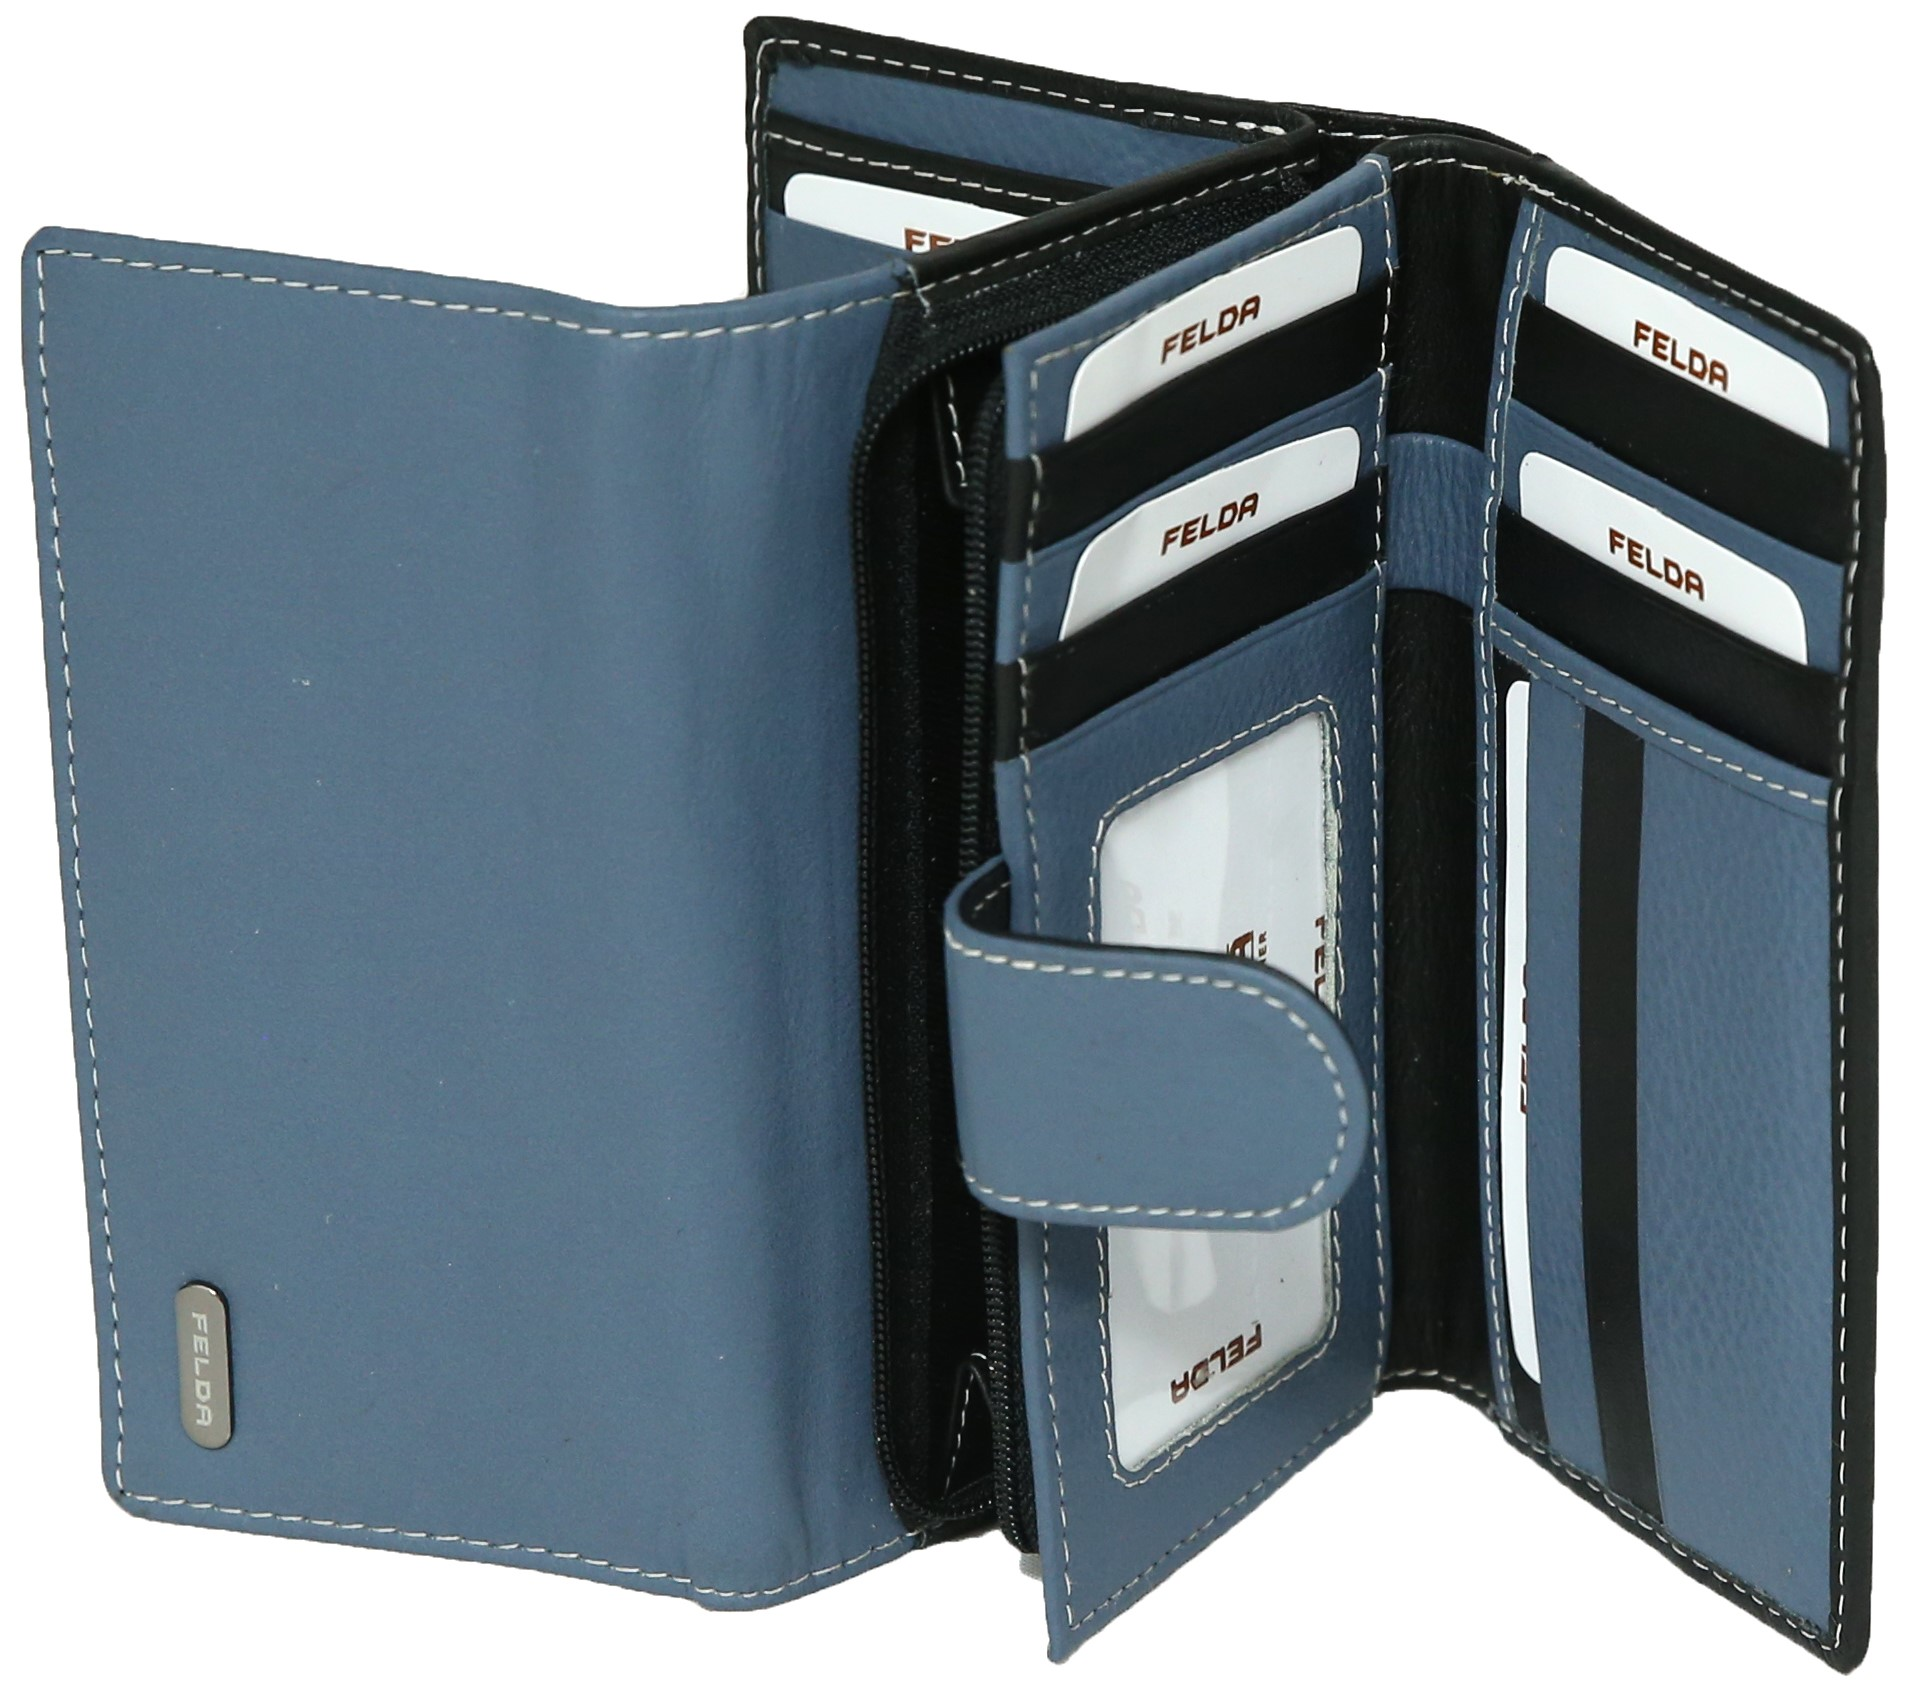 Felda-Portefeuille-pour-cartes-de-credit-cuir-souple-plusieurs-coloris miniature 29